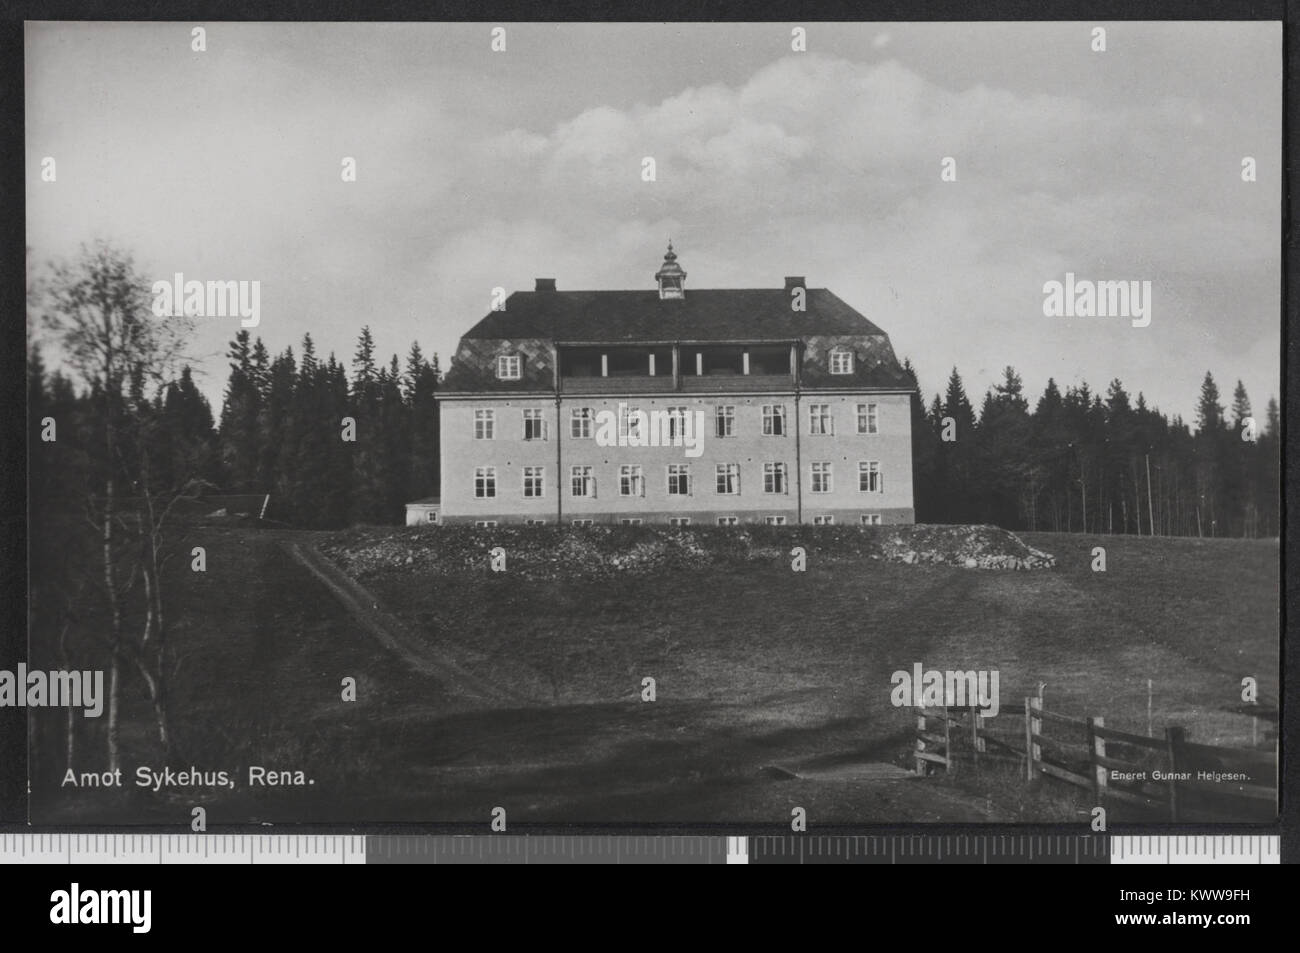 Åmot Sykehus, Rena-no-nb DigiFoto-Maker bldsa PK 30011 00088 20150810 Stockfoto